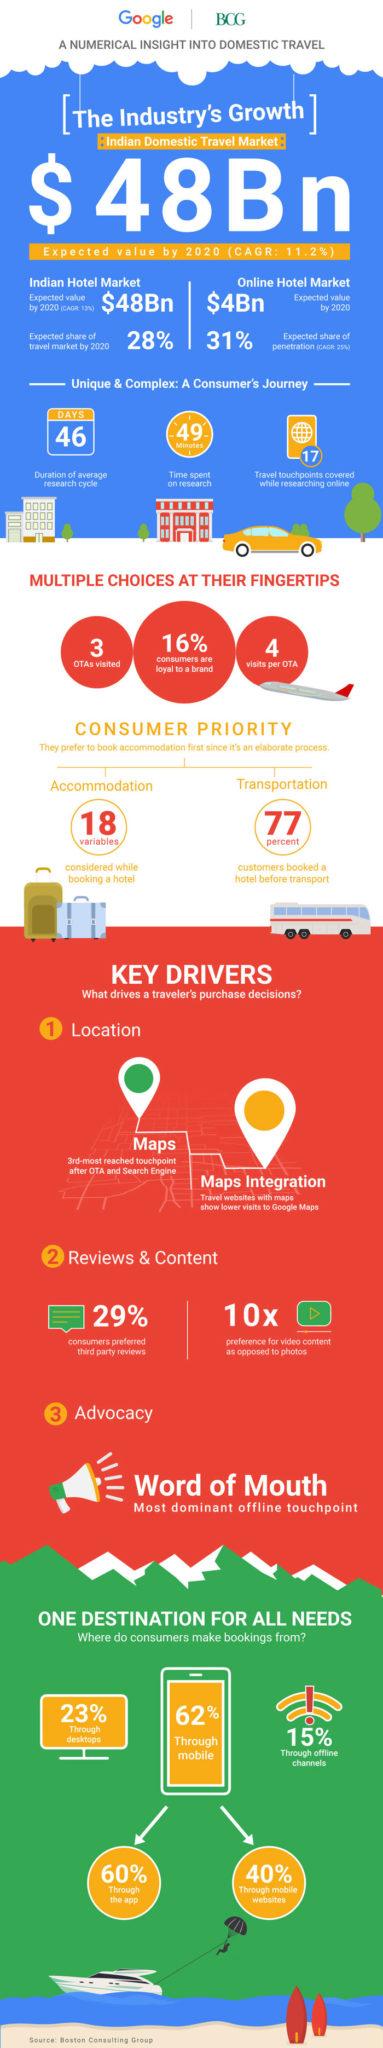 google india-bcg-online travel-indian-2020